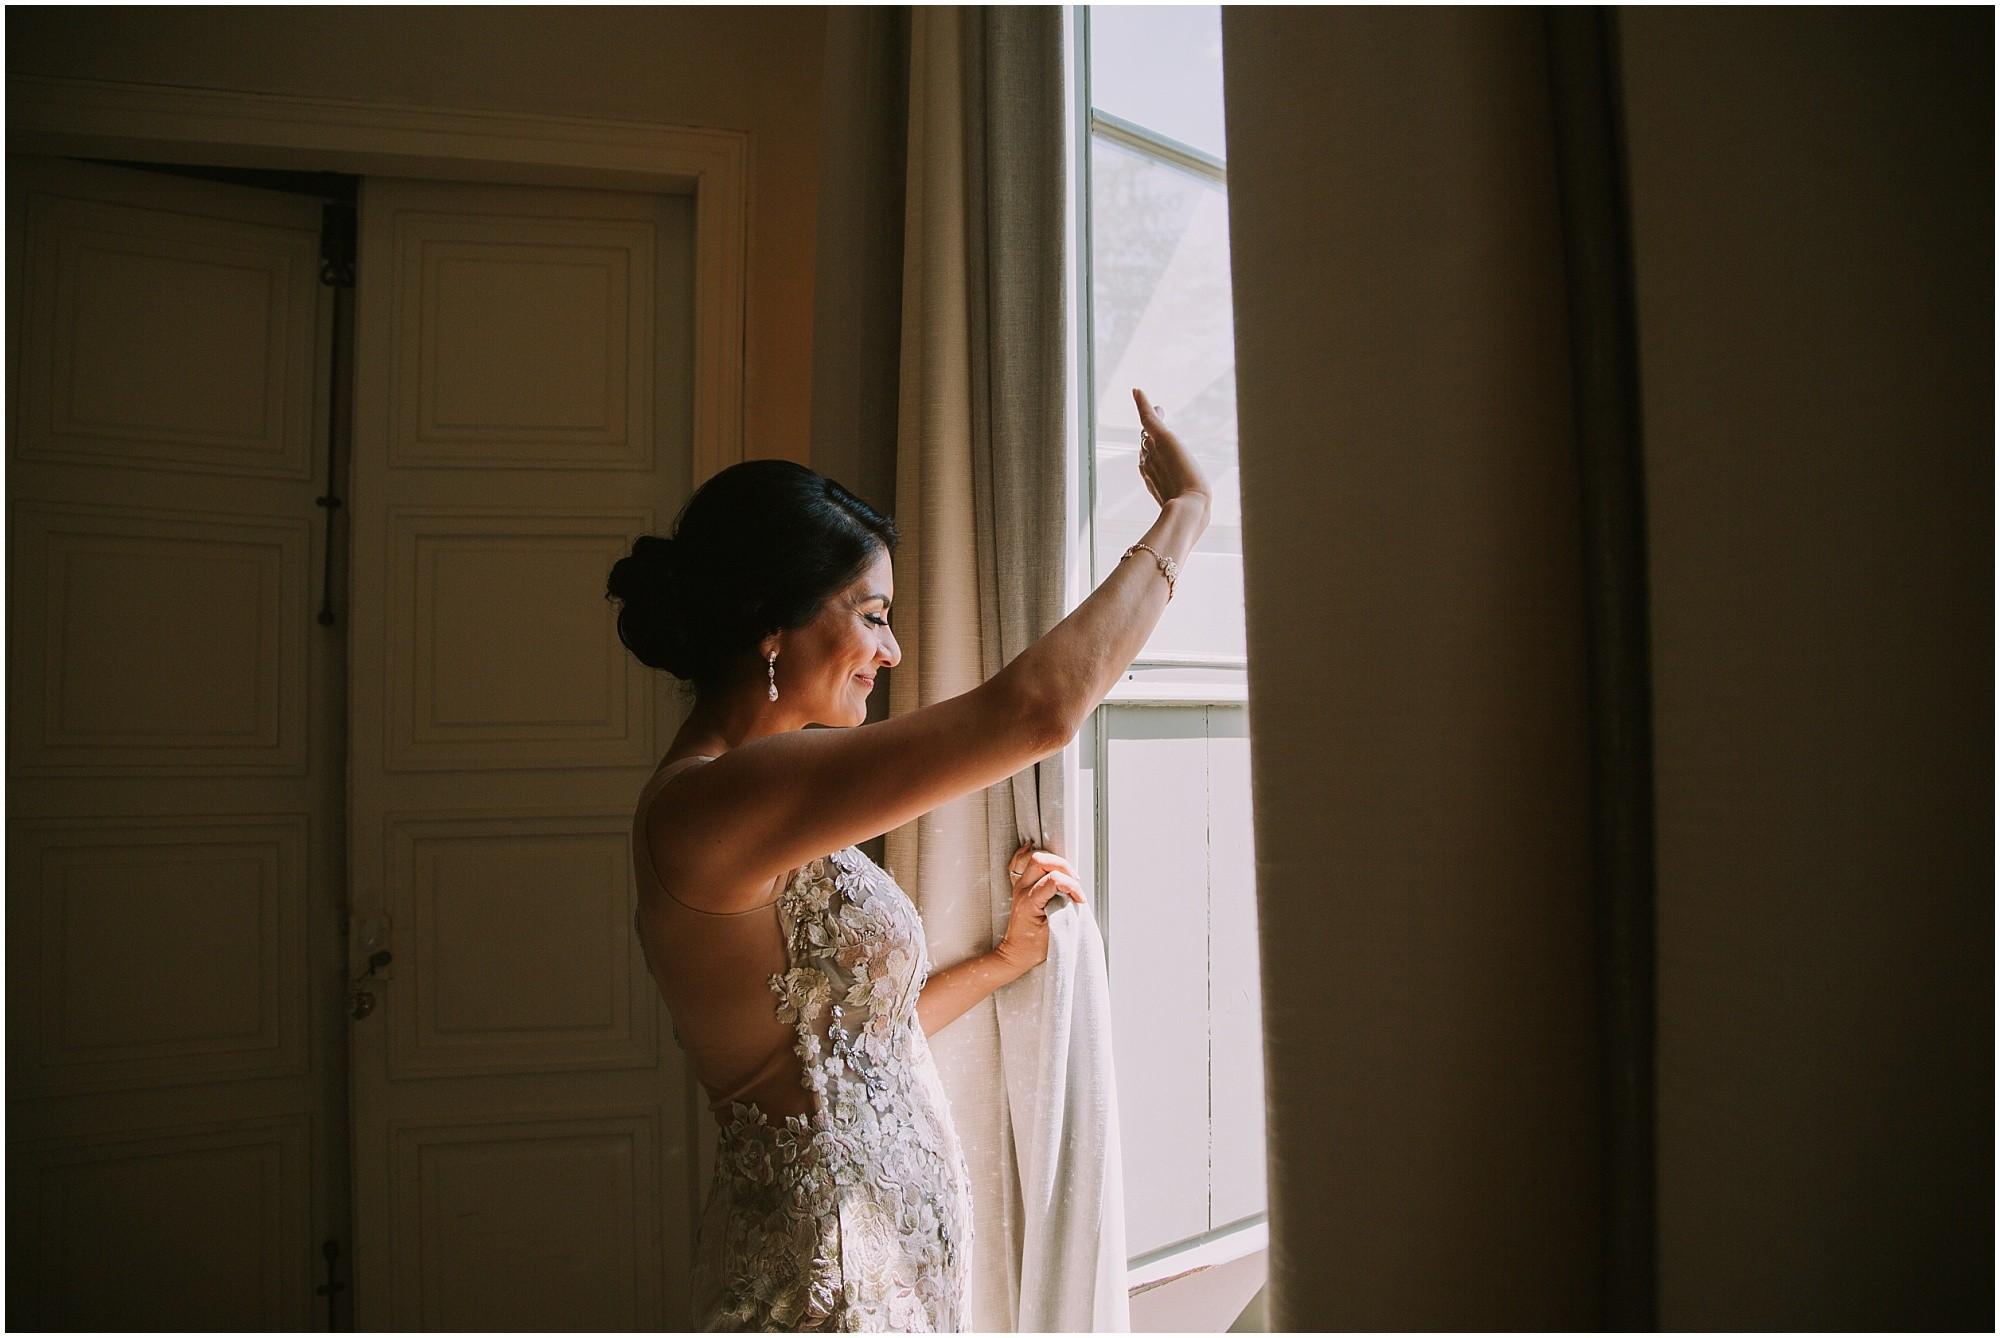 Kateryna-photos-photographer-mariage-chateau-saint-paterne-alencon-normandie-mayenne-le-mans_0039.jpg